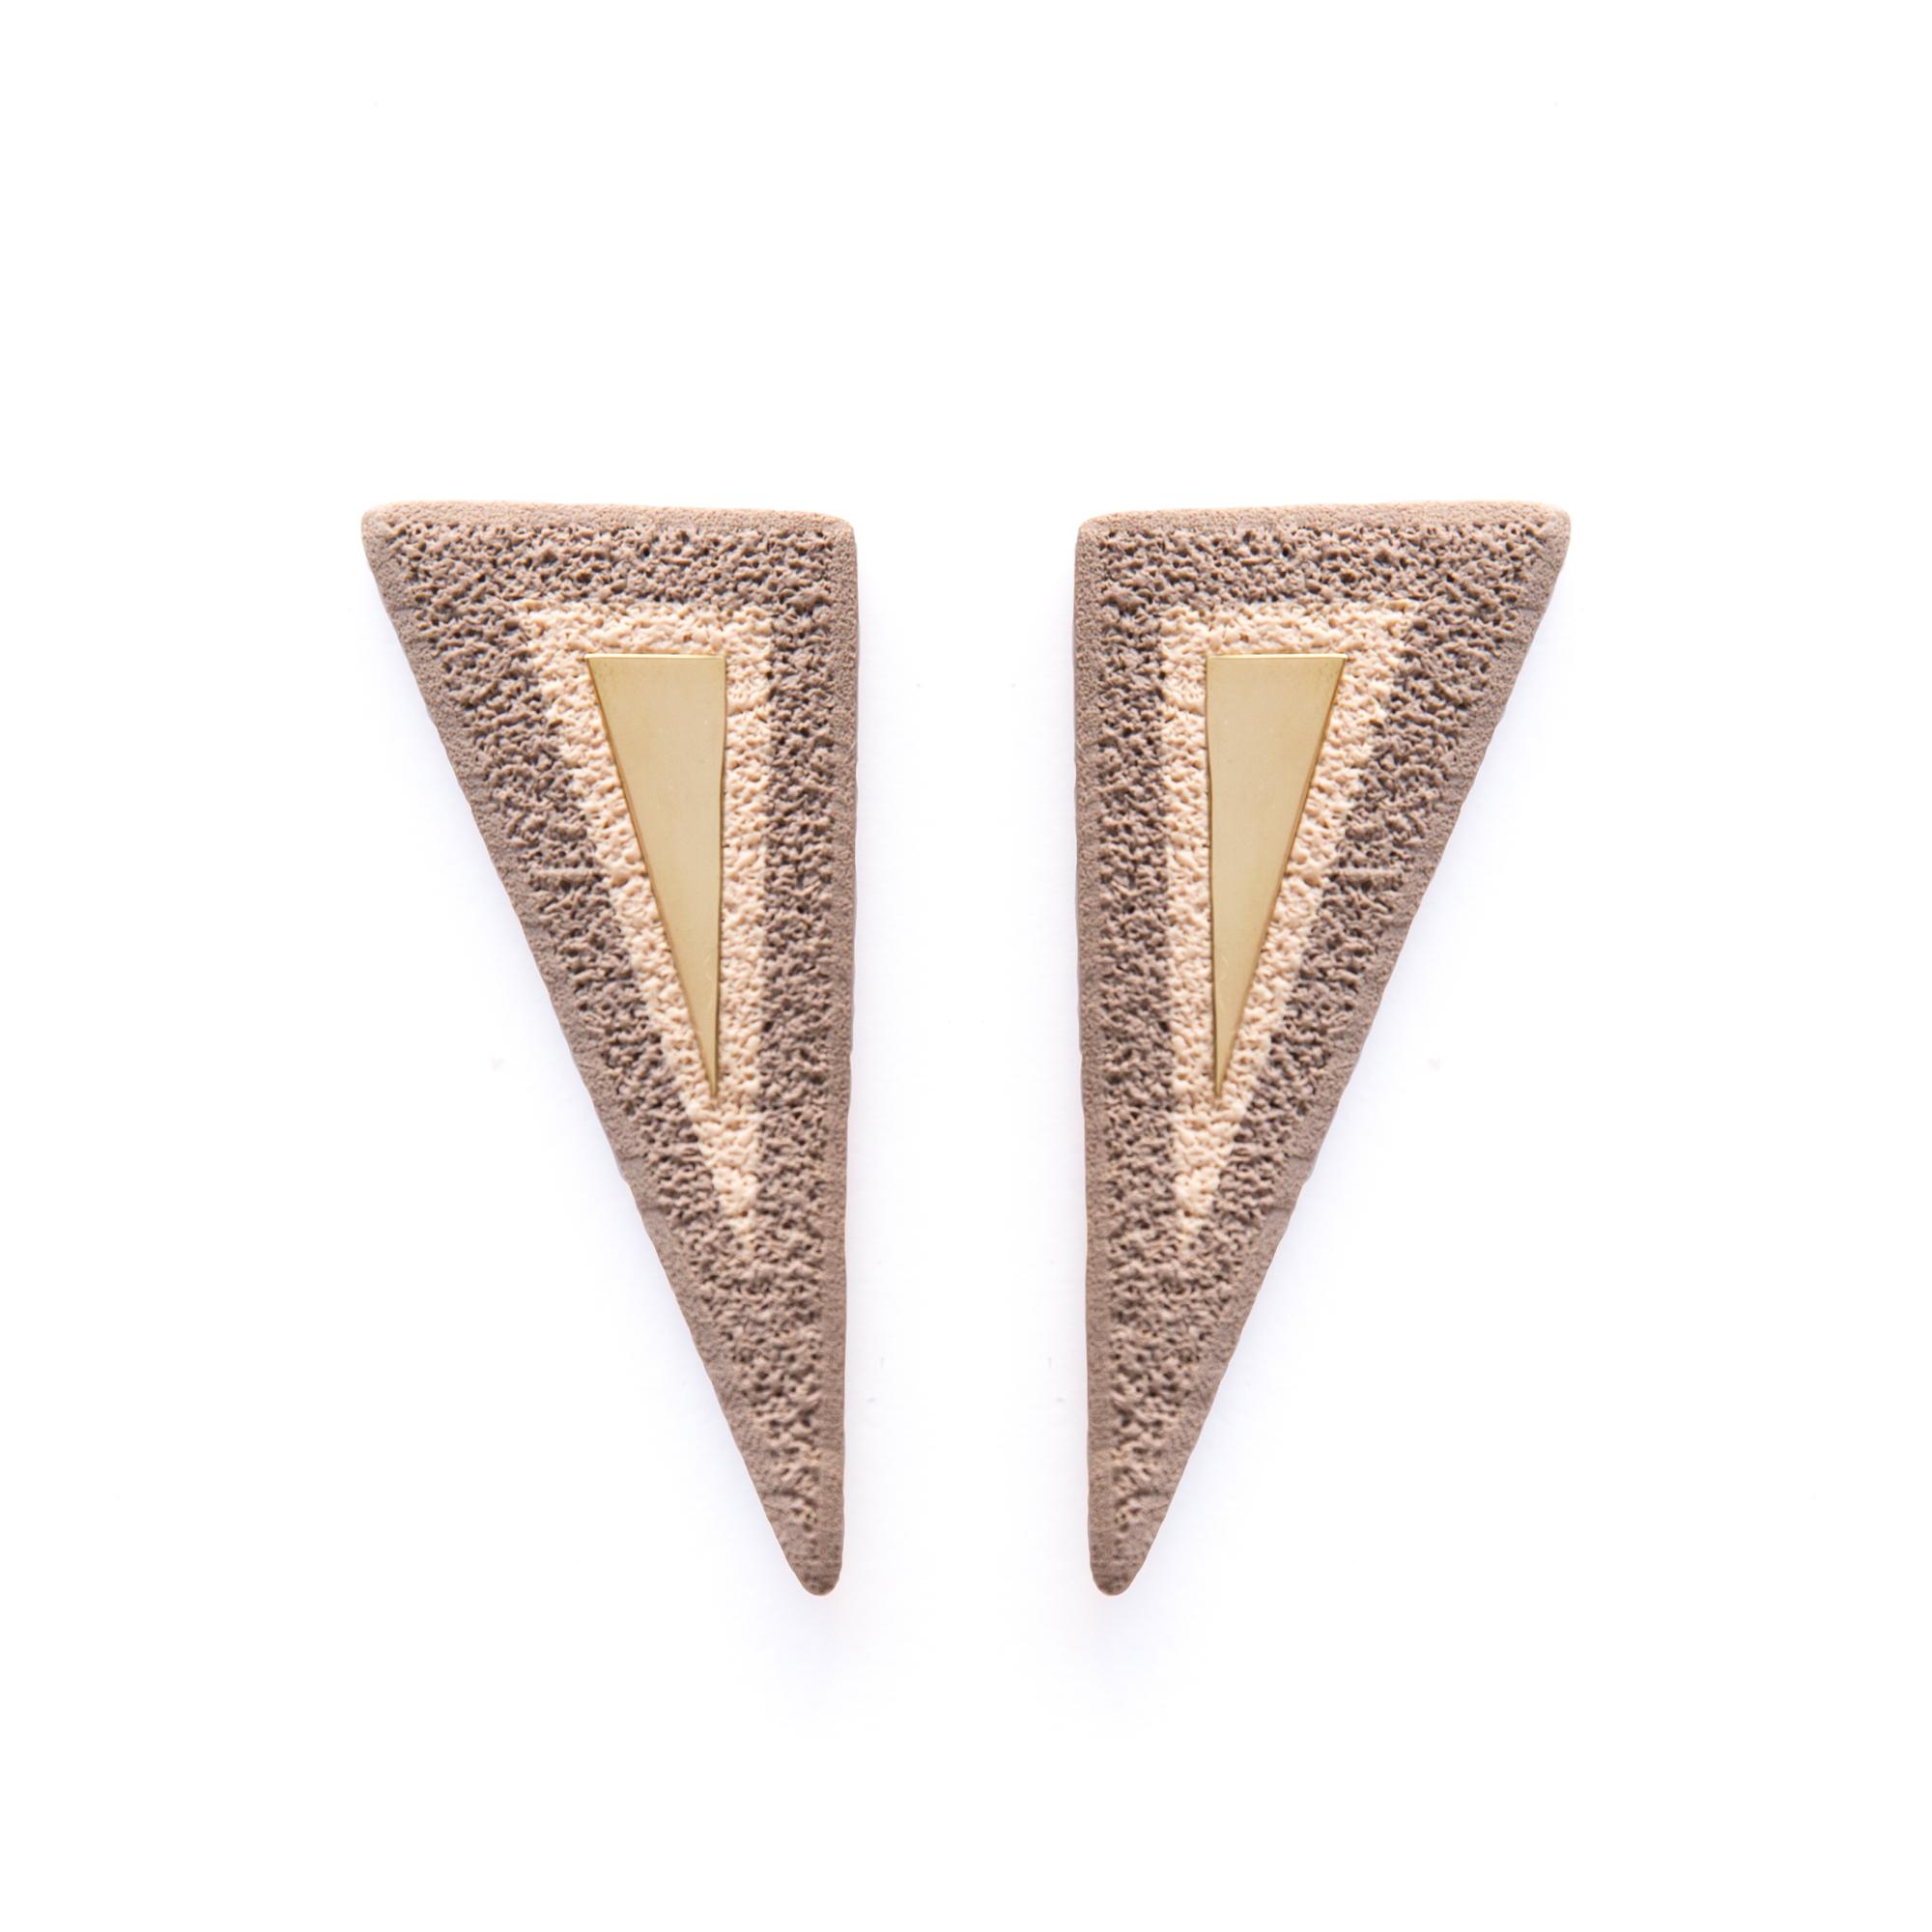 LimeLight jewelry collection by Katerina Sfinari geometric modern polymer clay handmade earrings